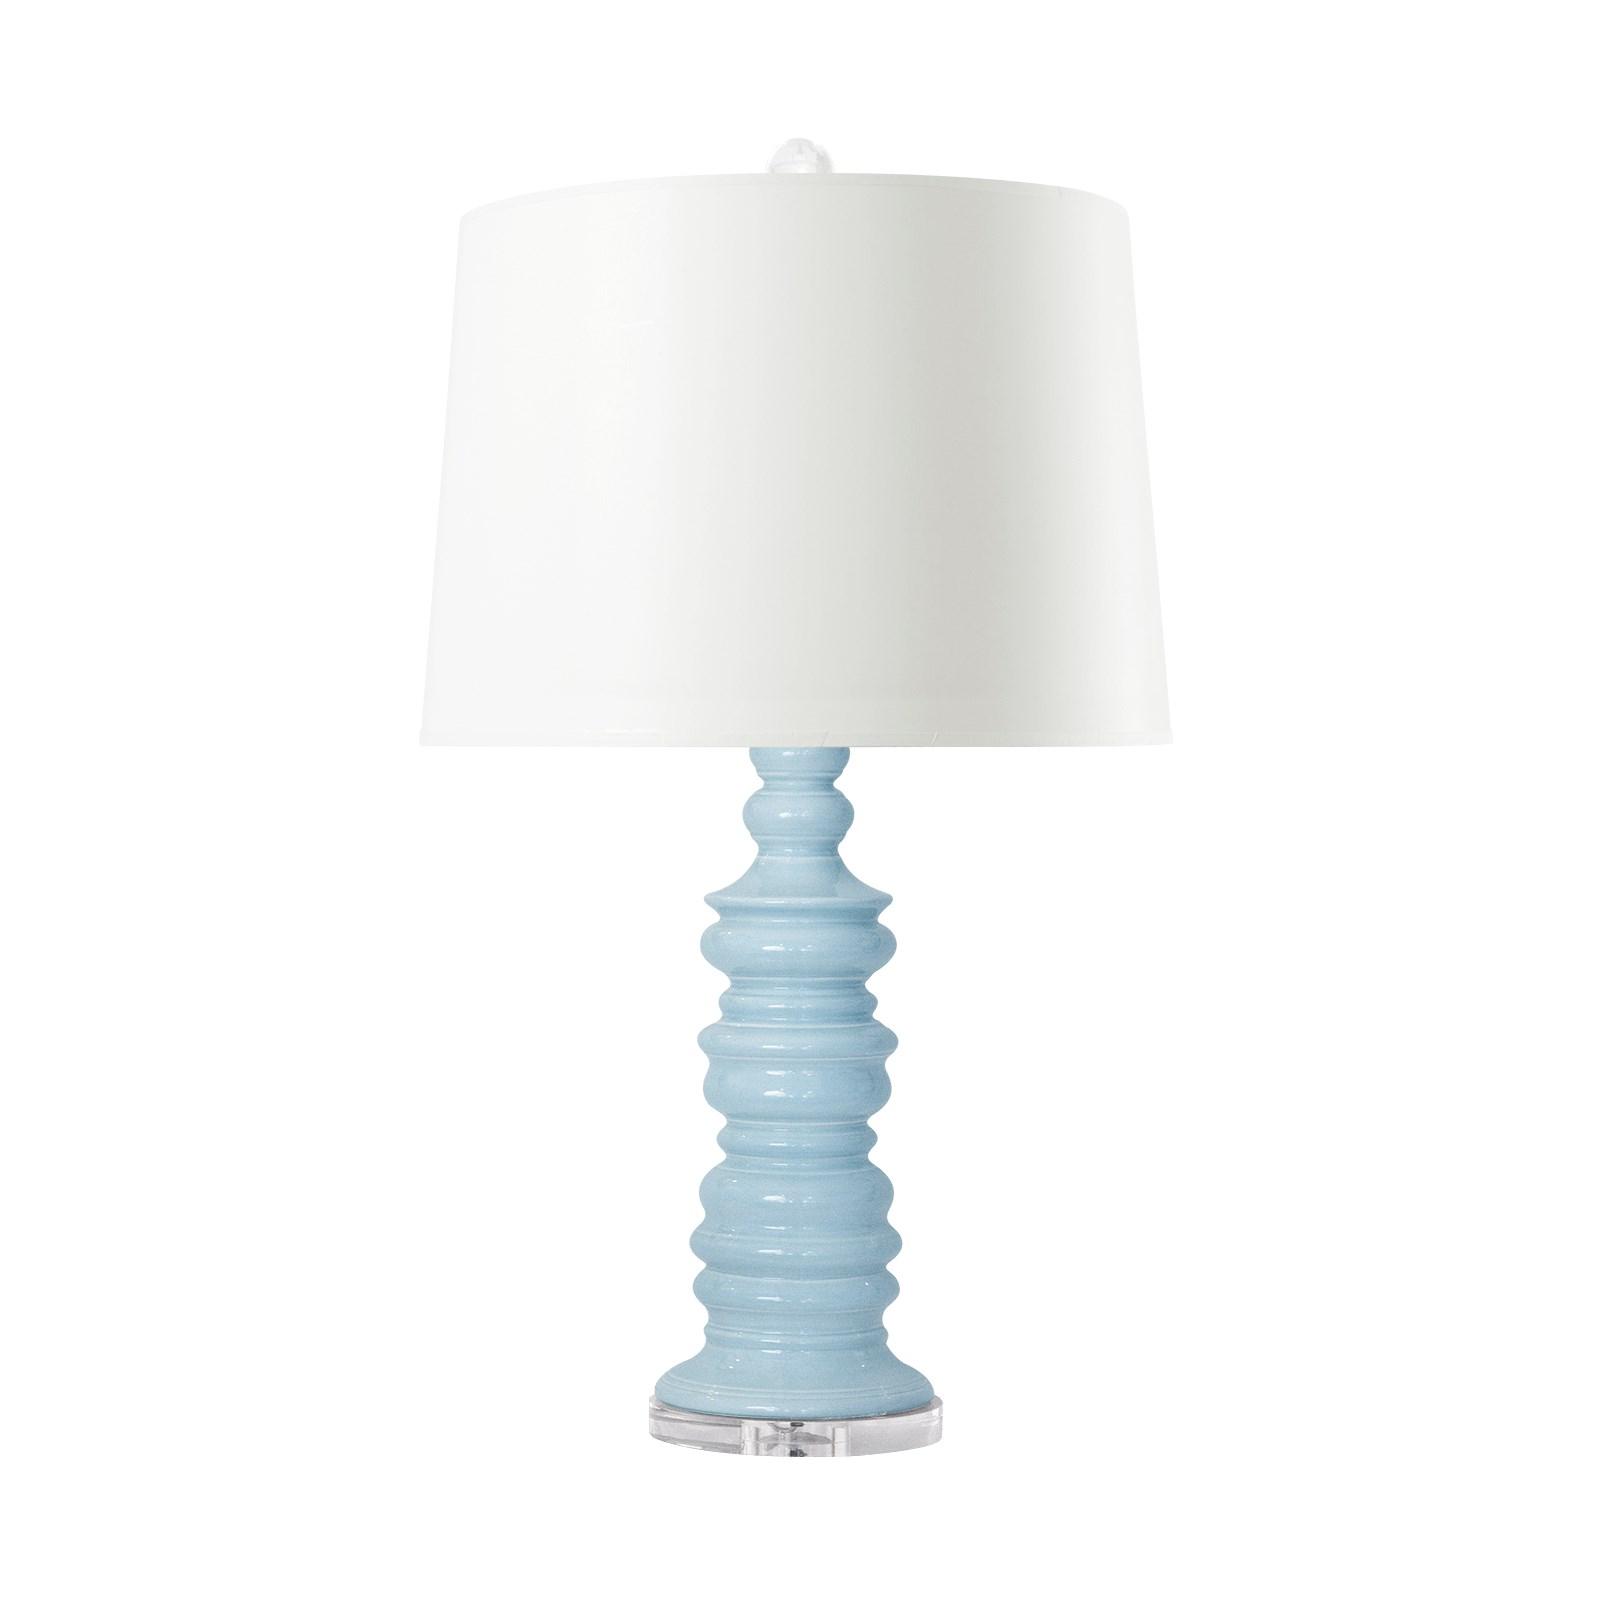 Aurora Lamp (Lamp Only), Light Blue